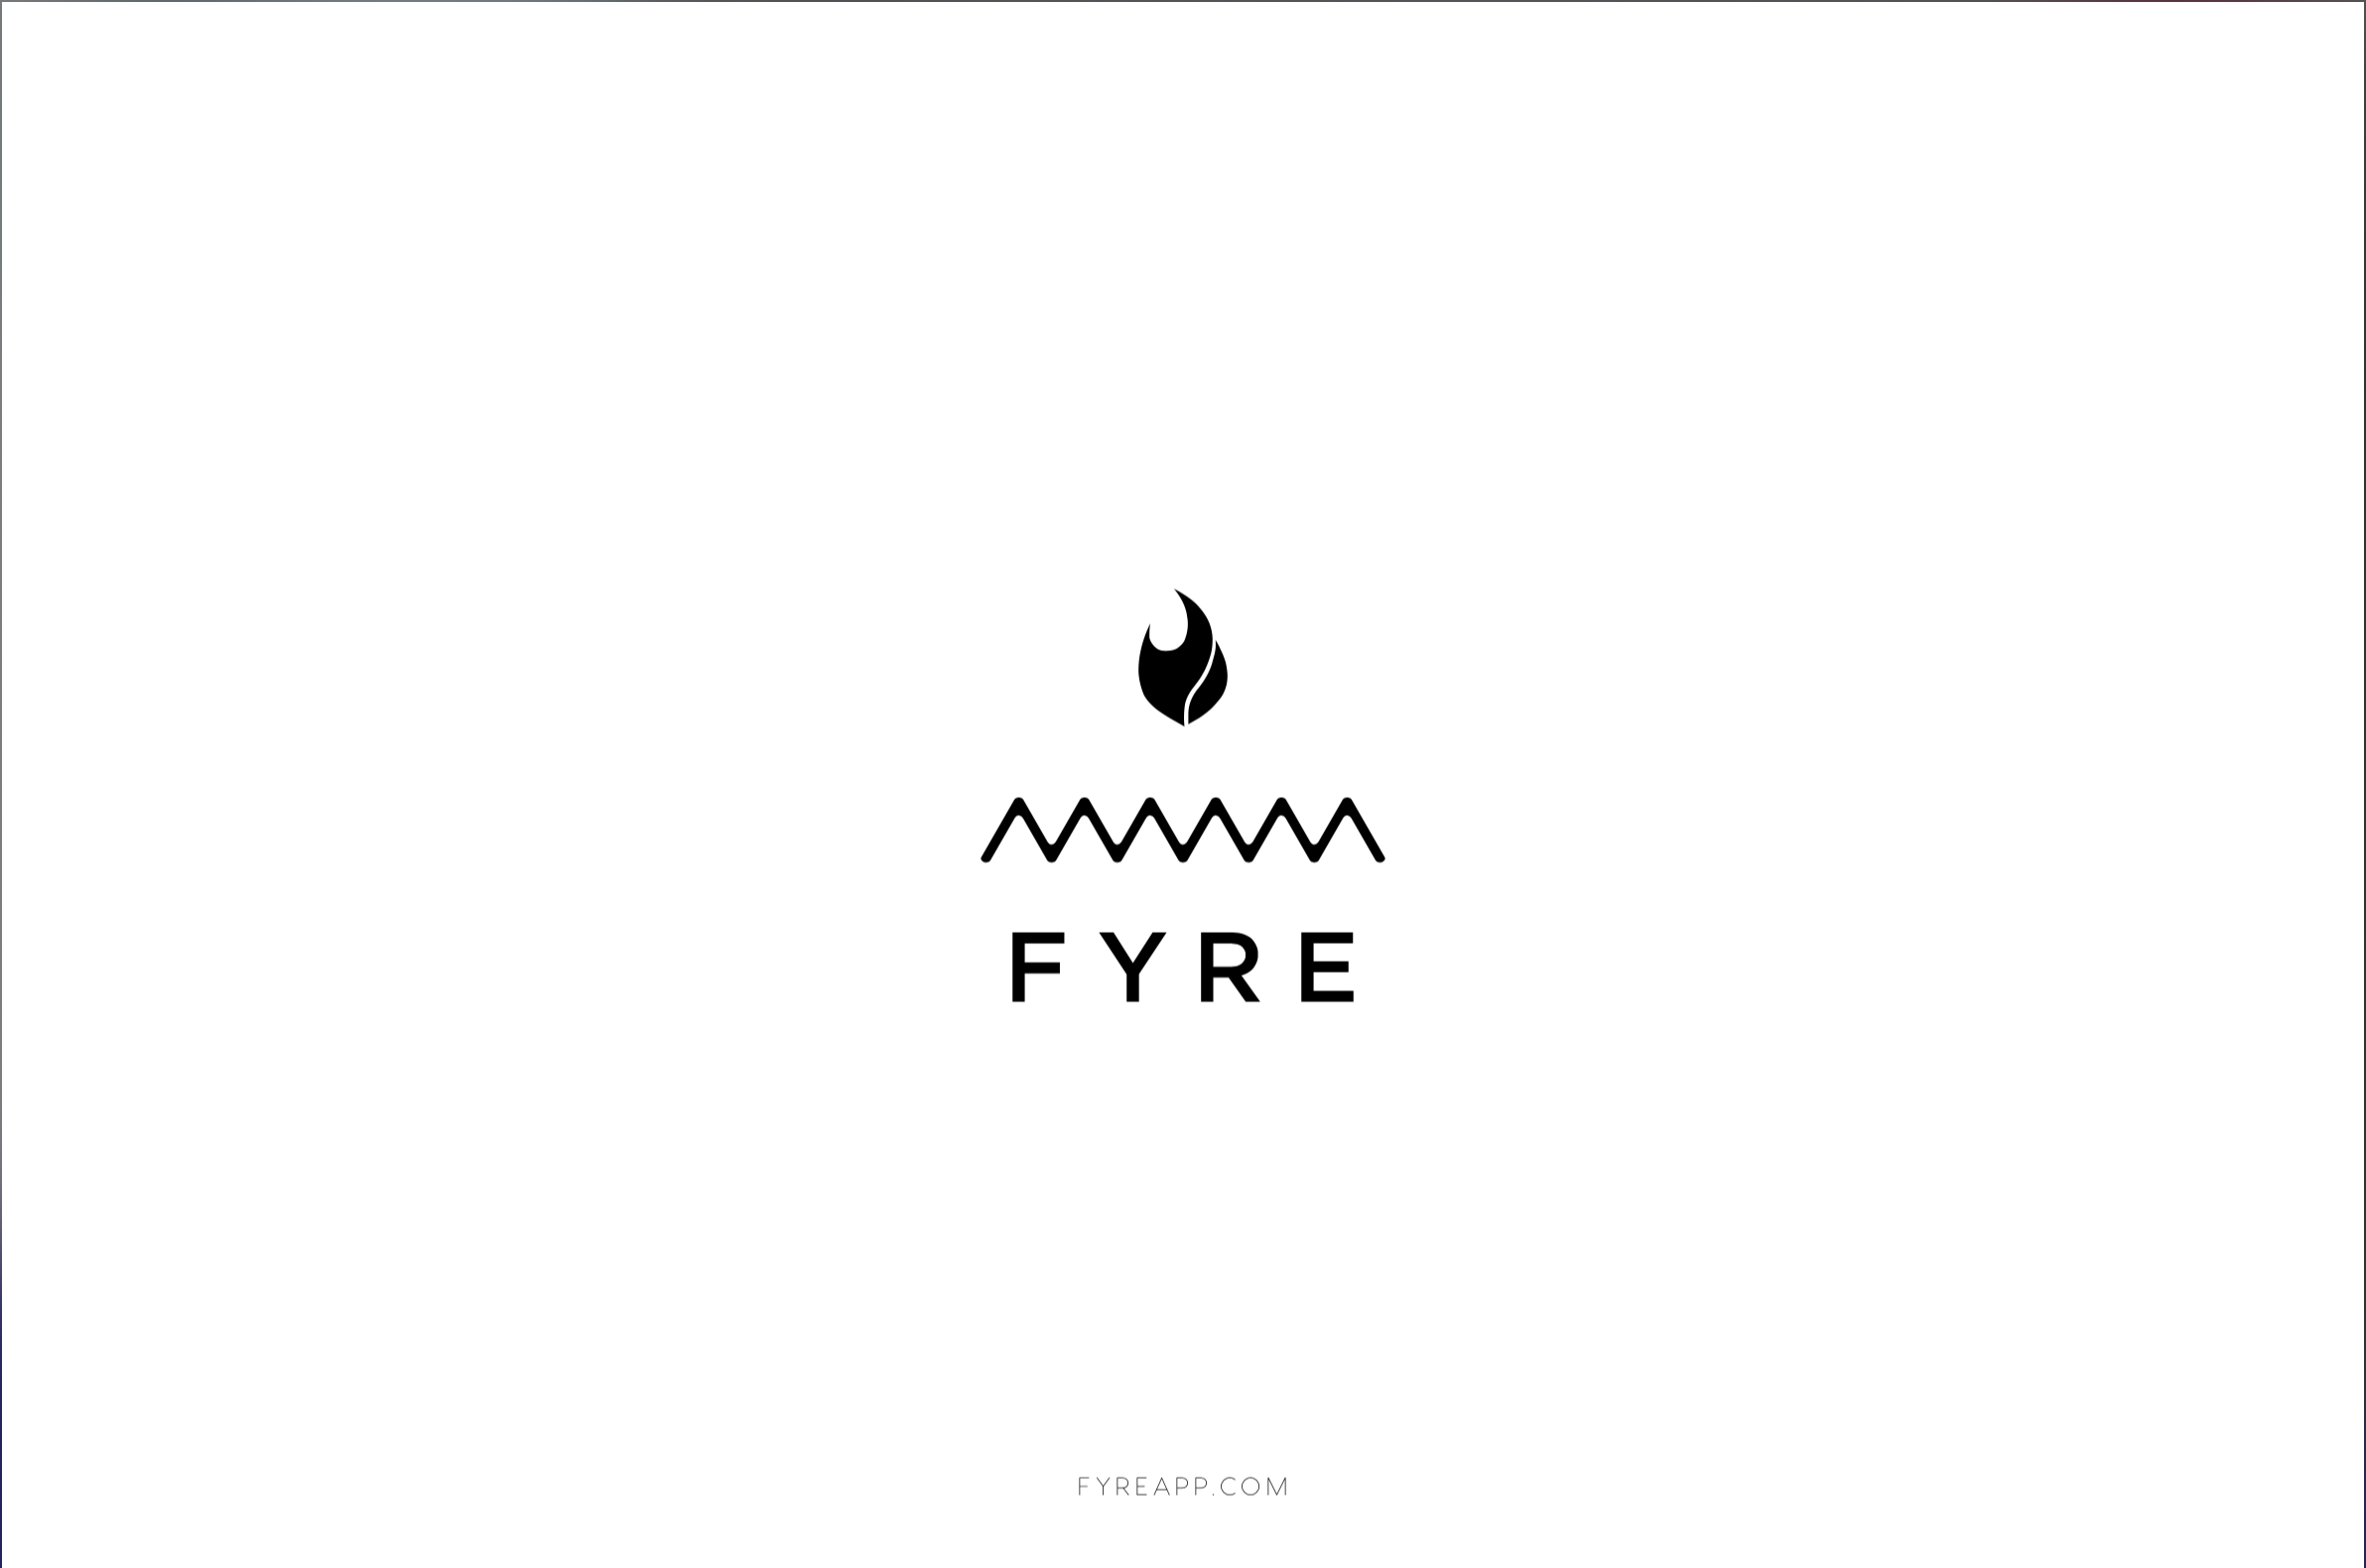 Fyre Festival Pitch Deck Pdf